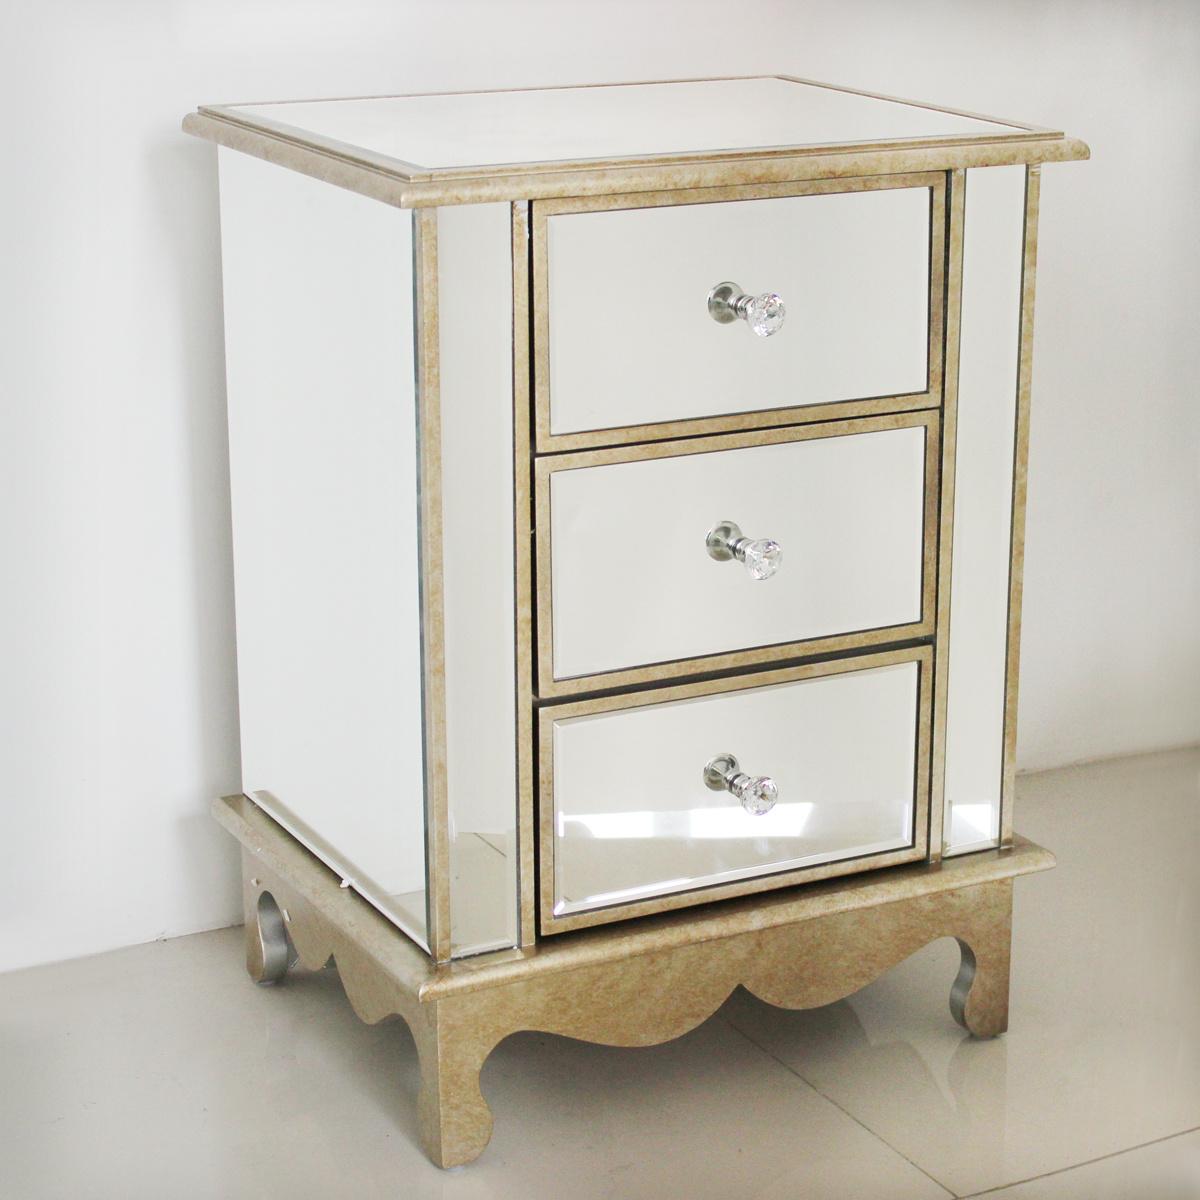 Mirrored Bedside Table Vintage Antique Cabinet 3 Drawer